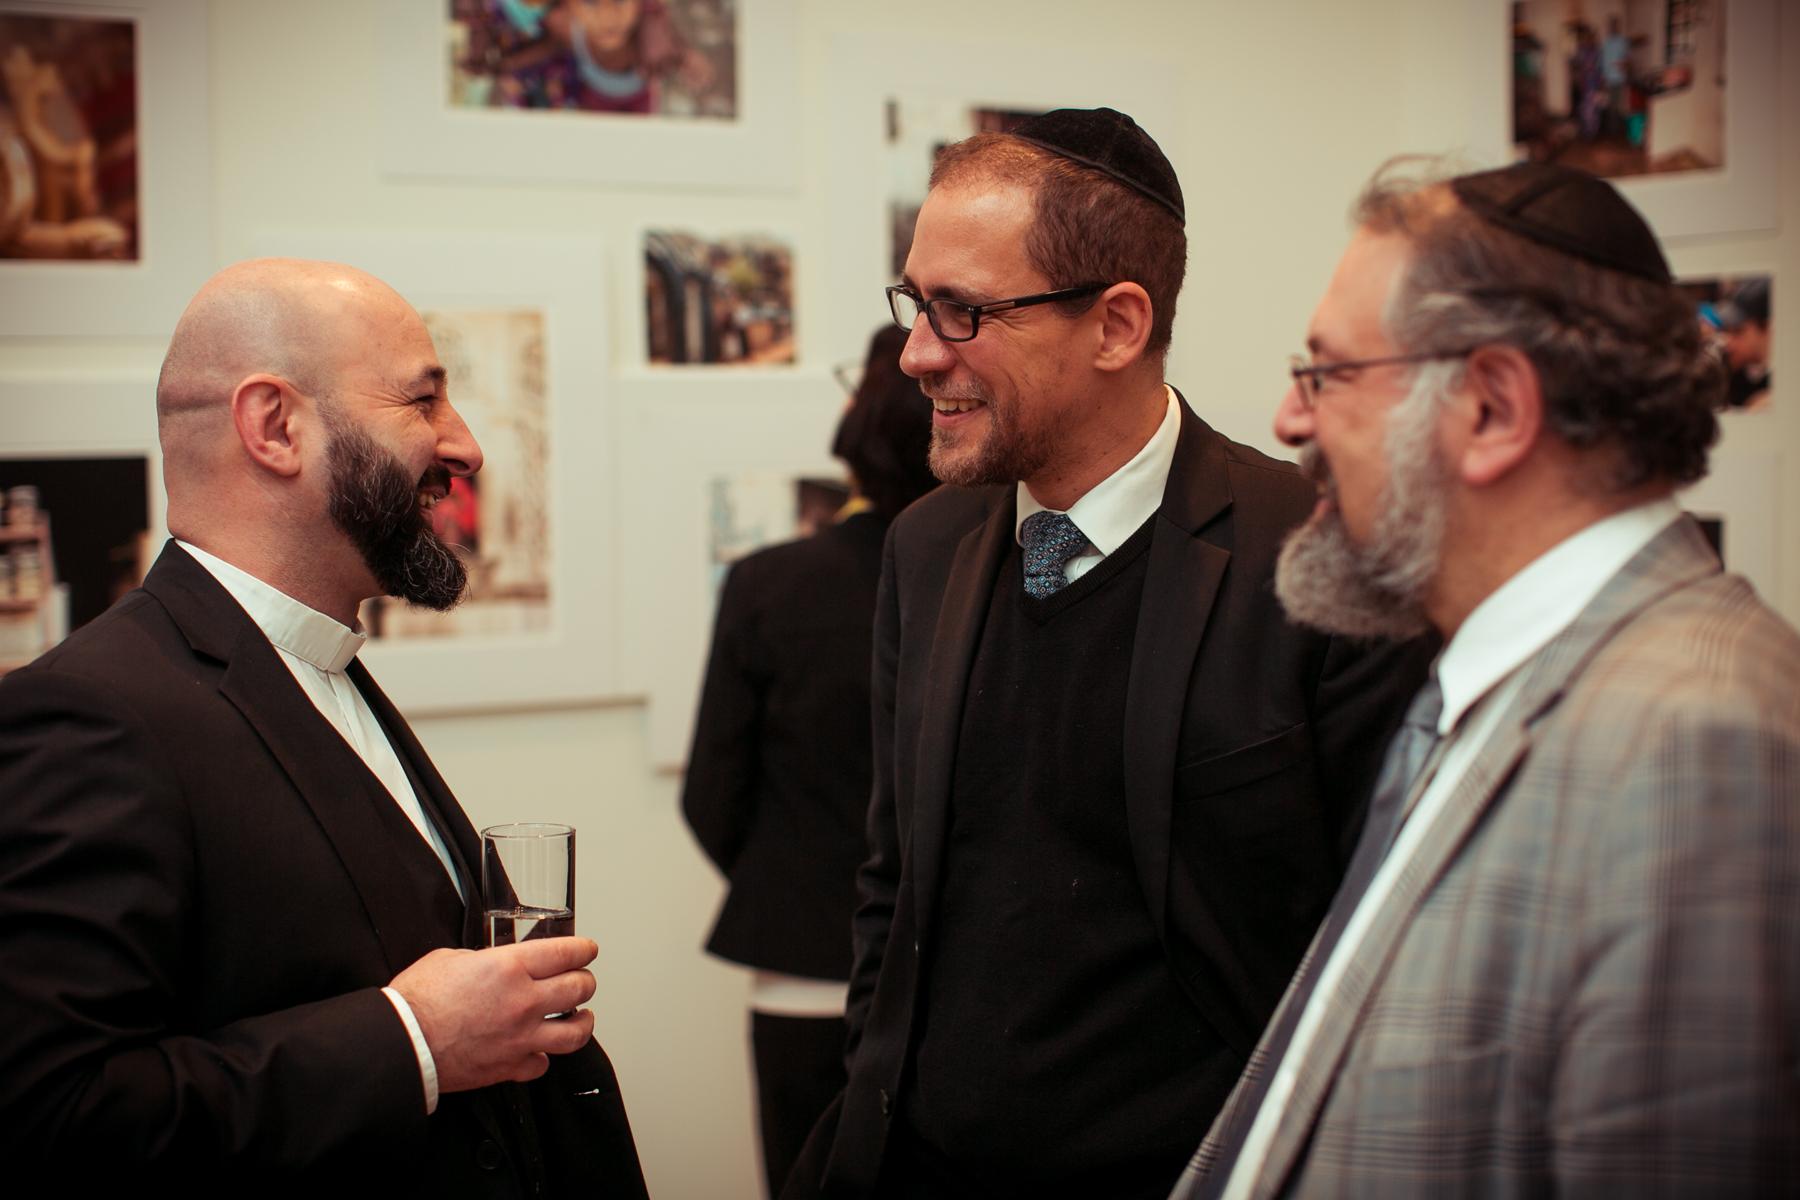 WIHW Rabbi Hofmeister